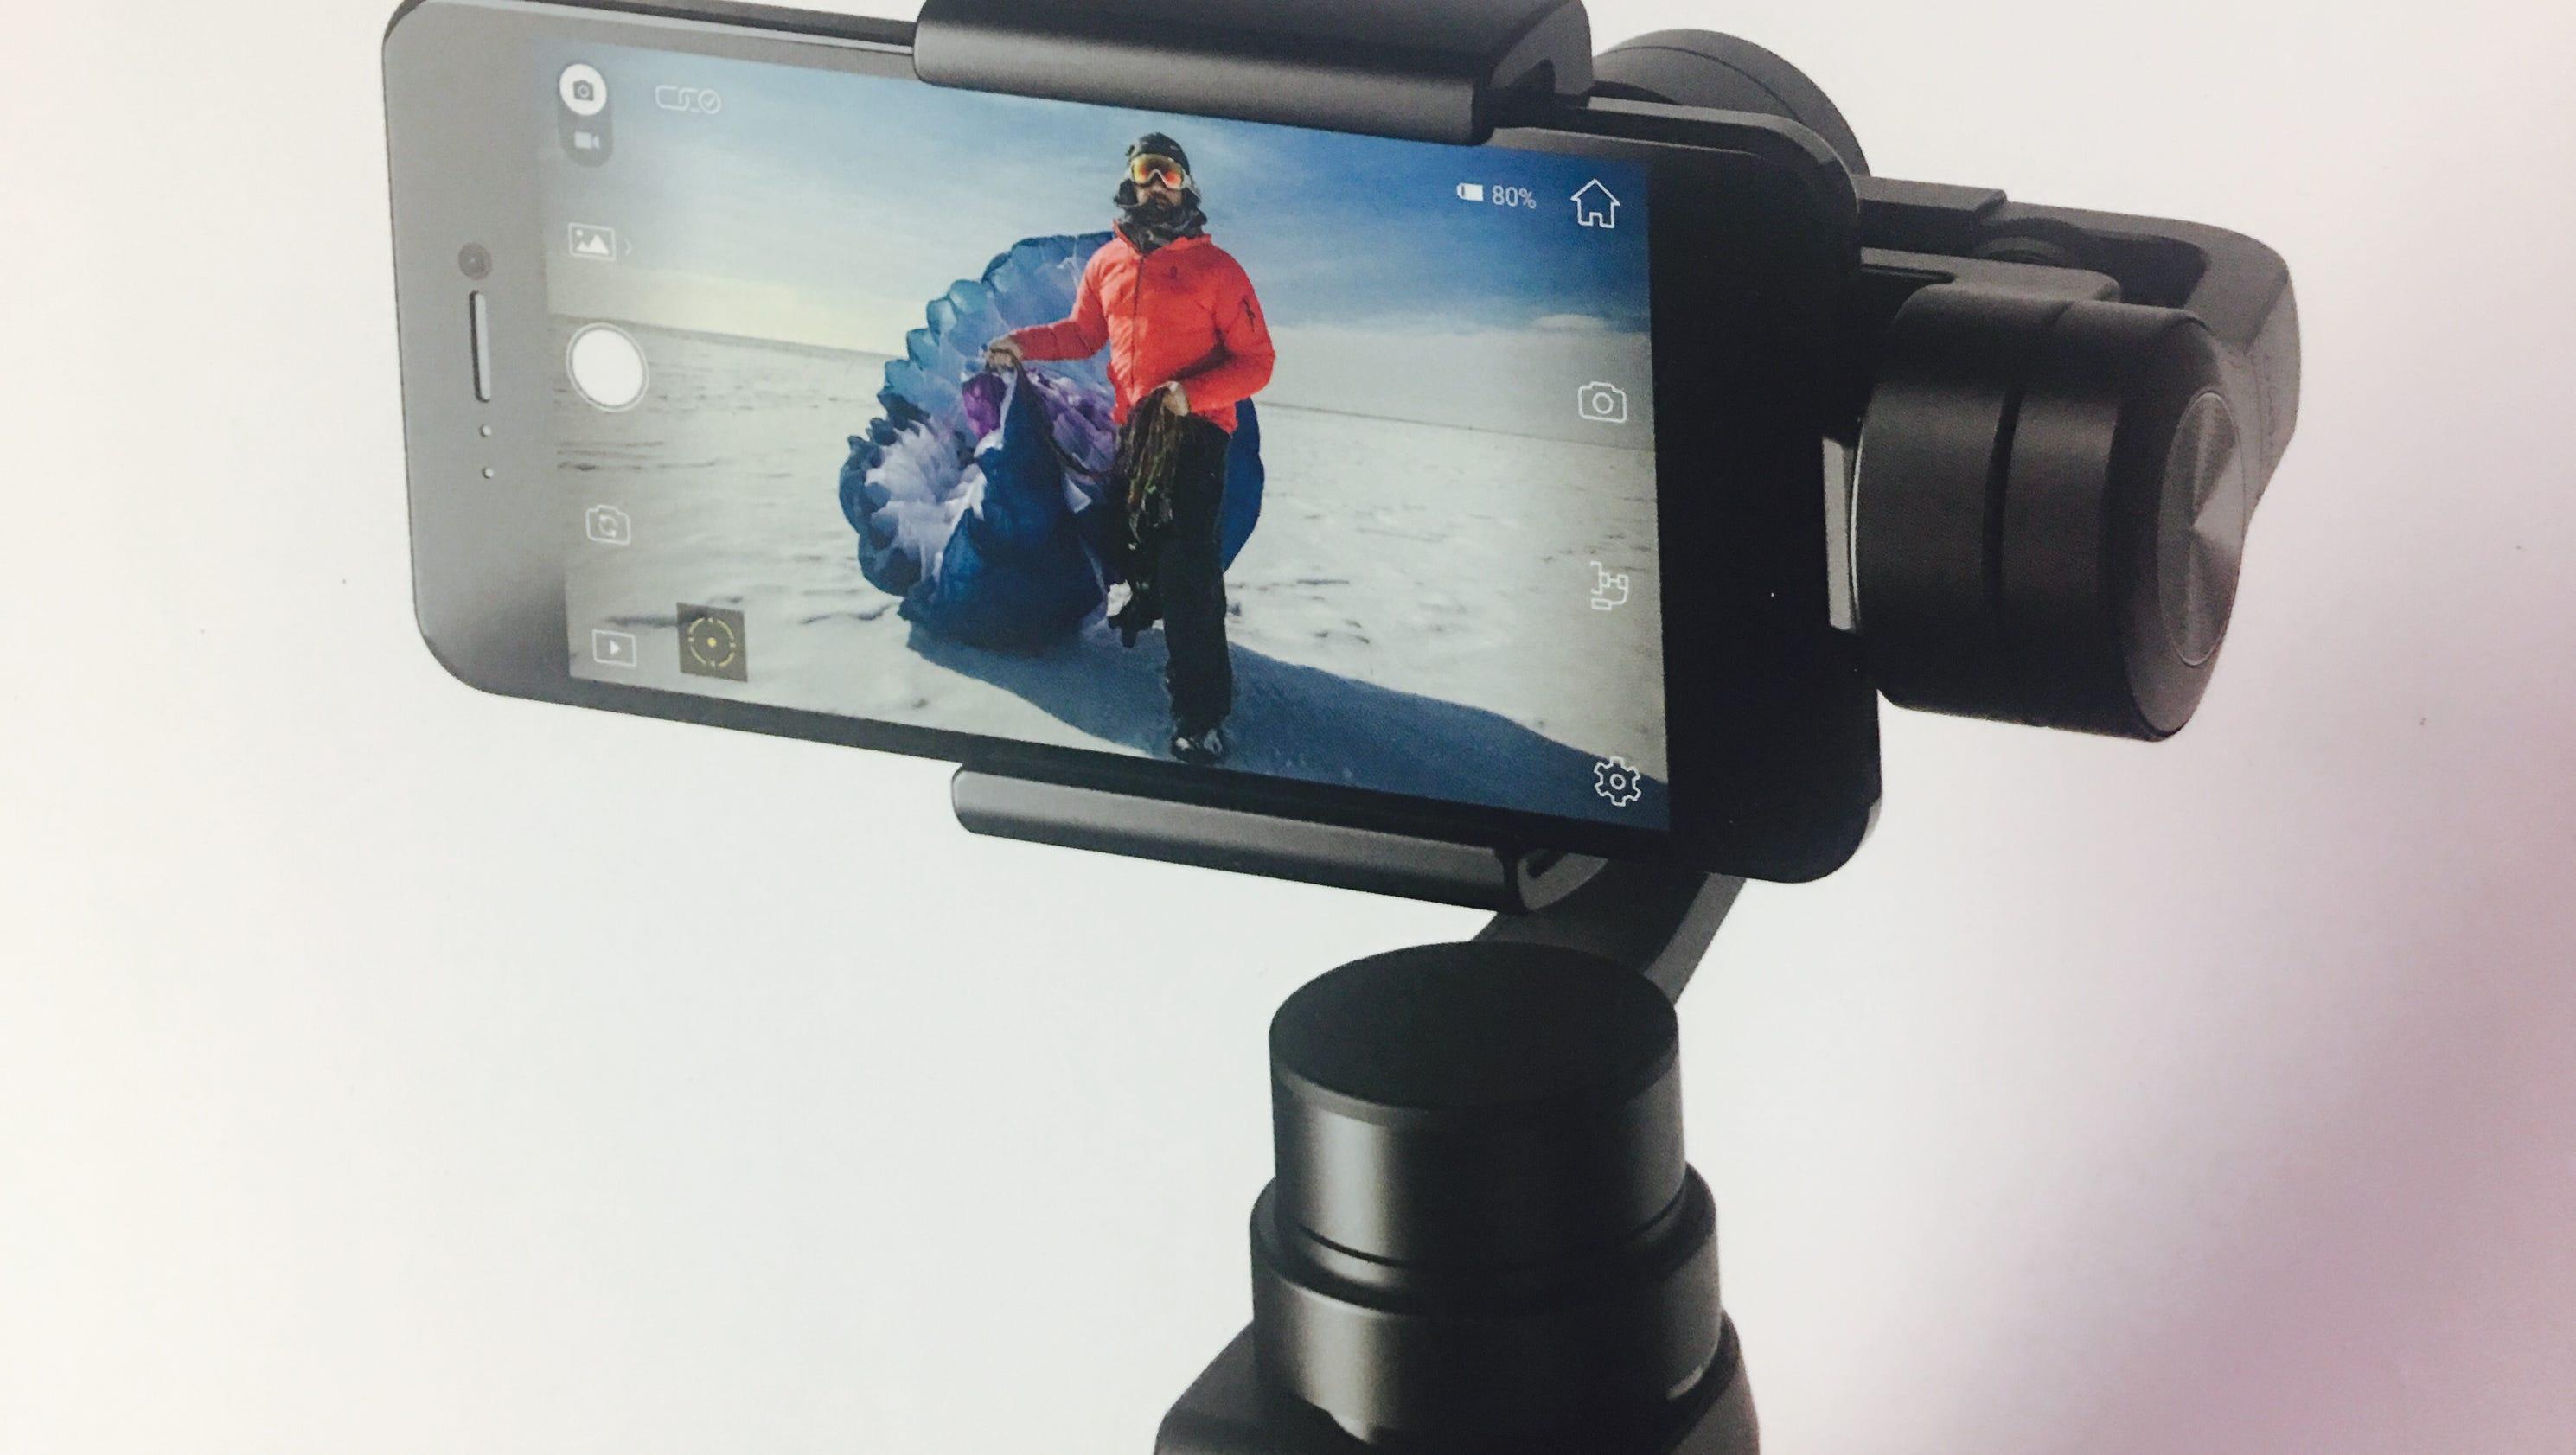 DJI's new rig to steady smartphone camera